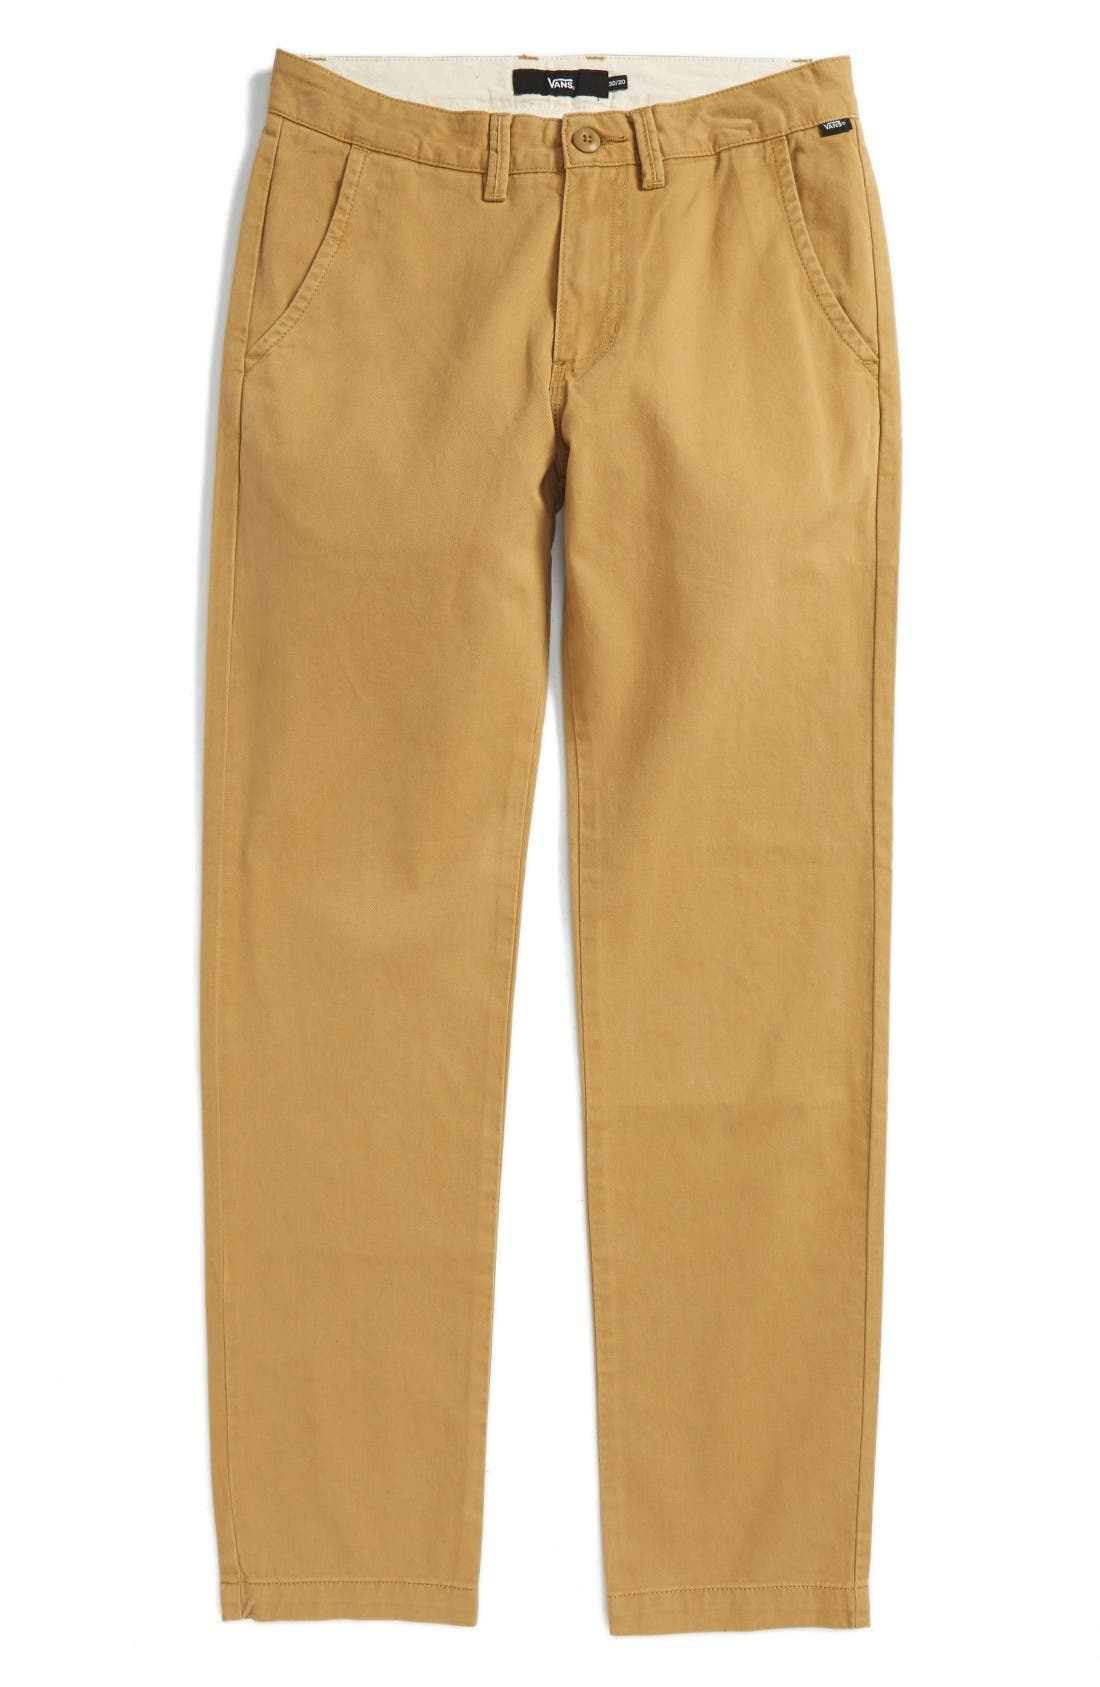 VANS Authentic Chino Pants